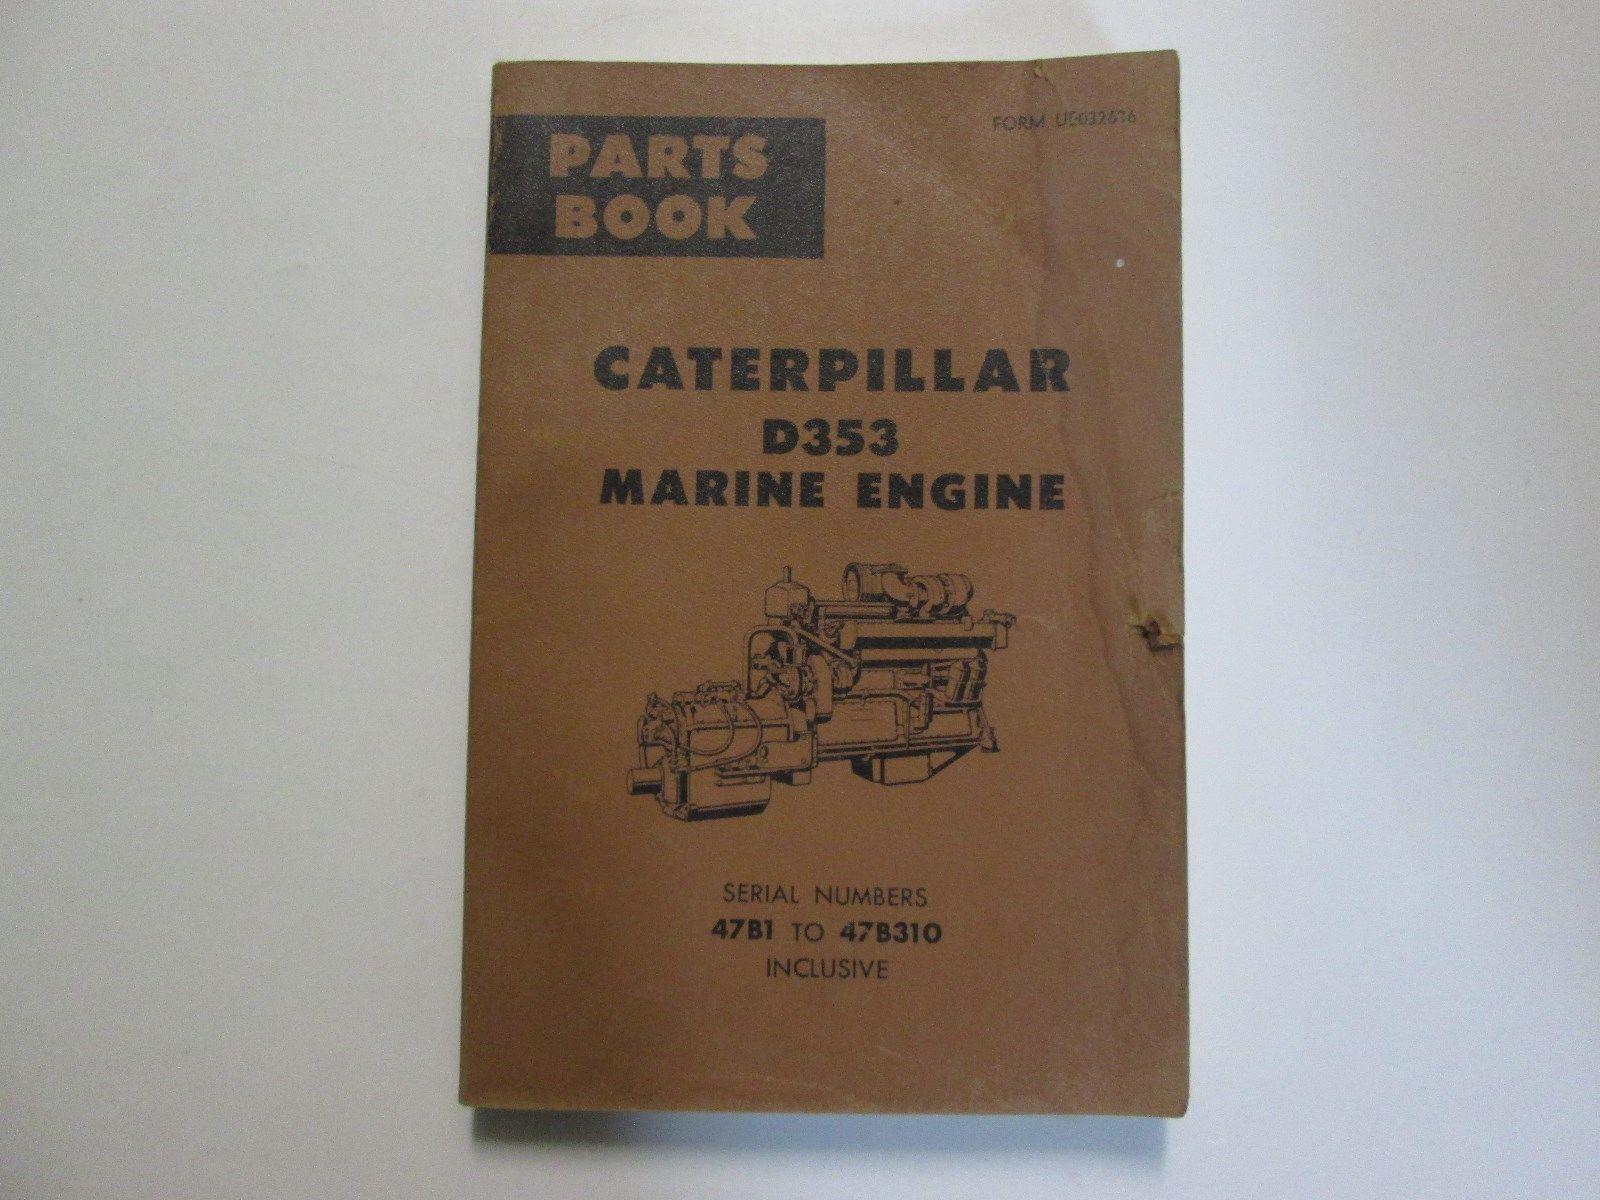 Caterpillar D353 Marine Engine Parts Book Manual 47B1 To 47B310 USED CAT OEM